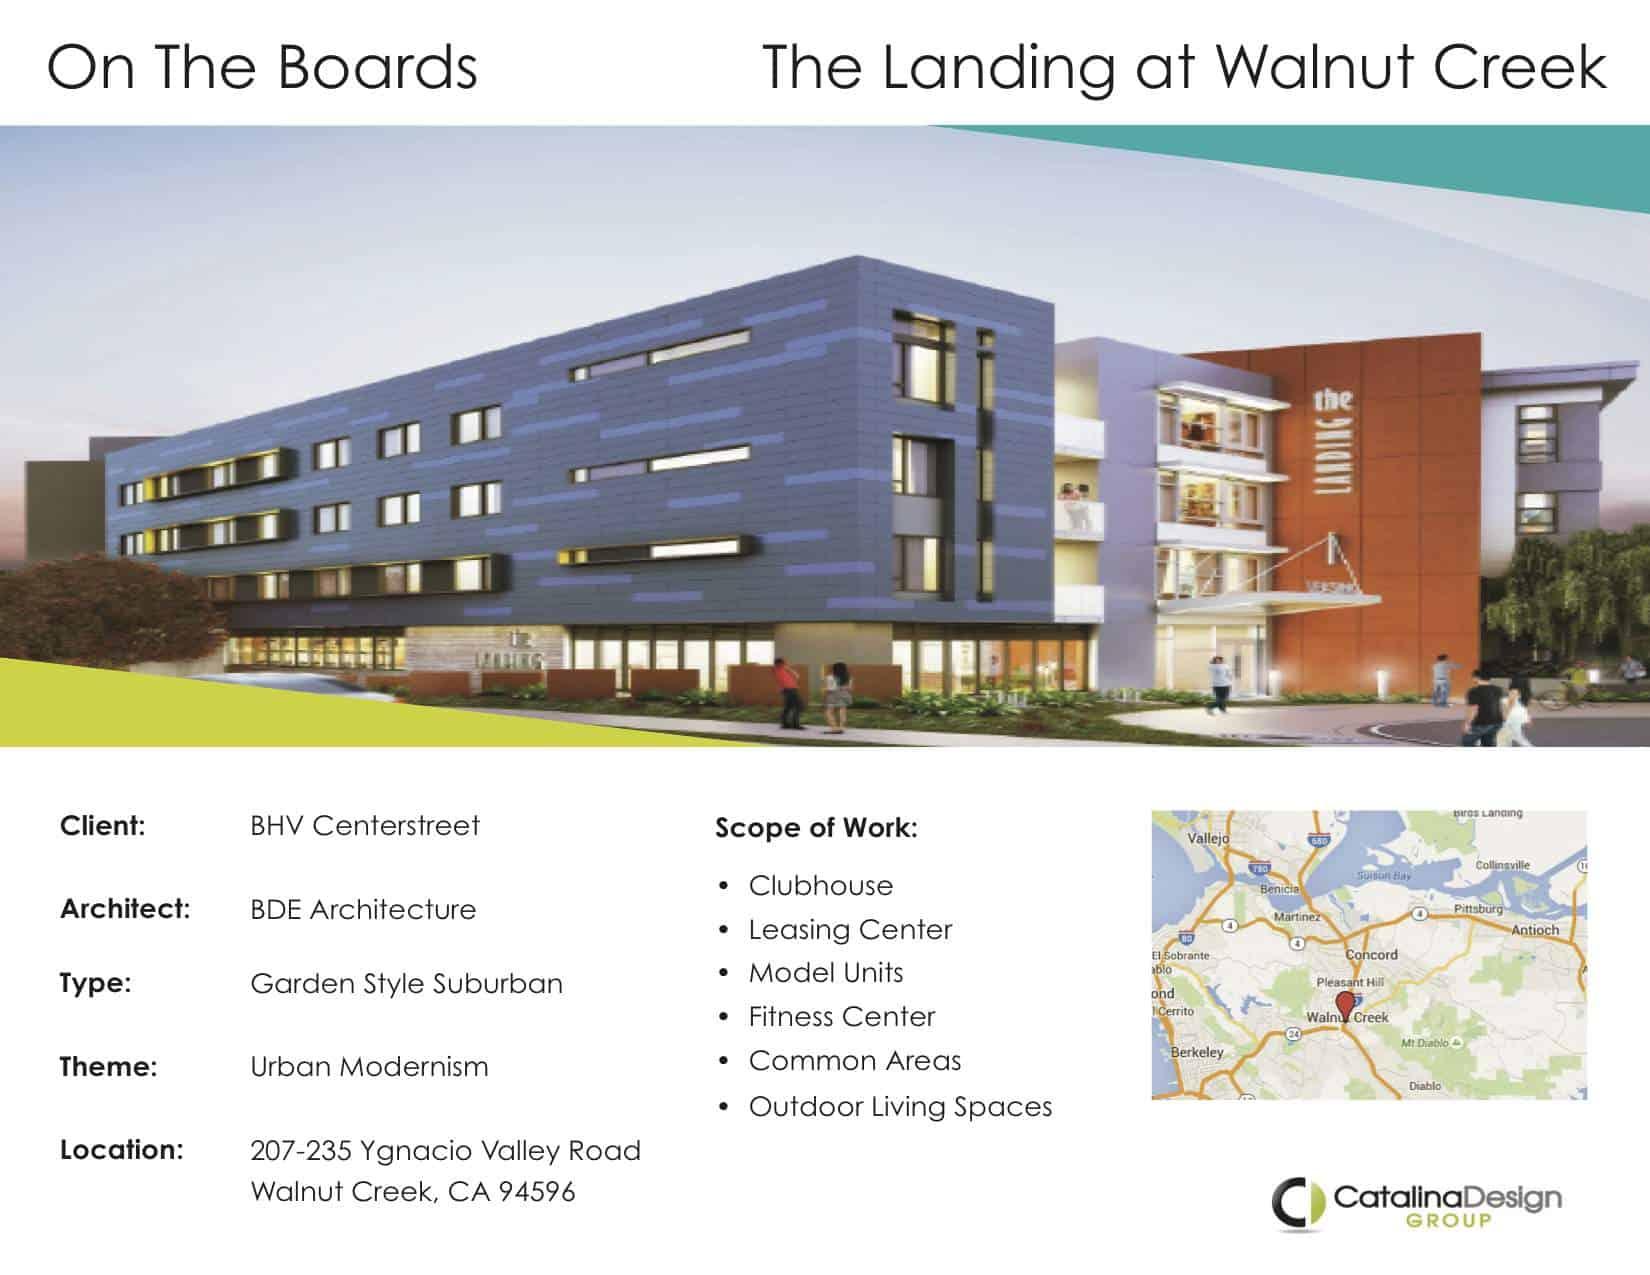 The Landing at Walnut Creek BHV Centerstreet Walnut Creek, CA, Commercial Interior Design Projects